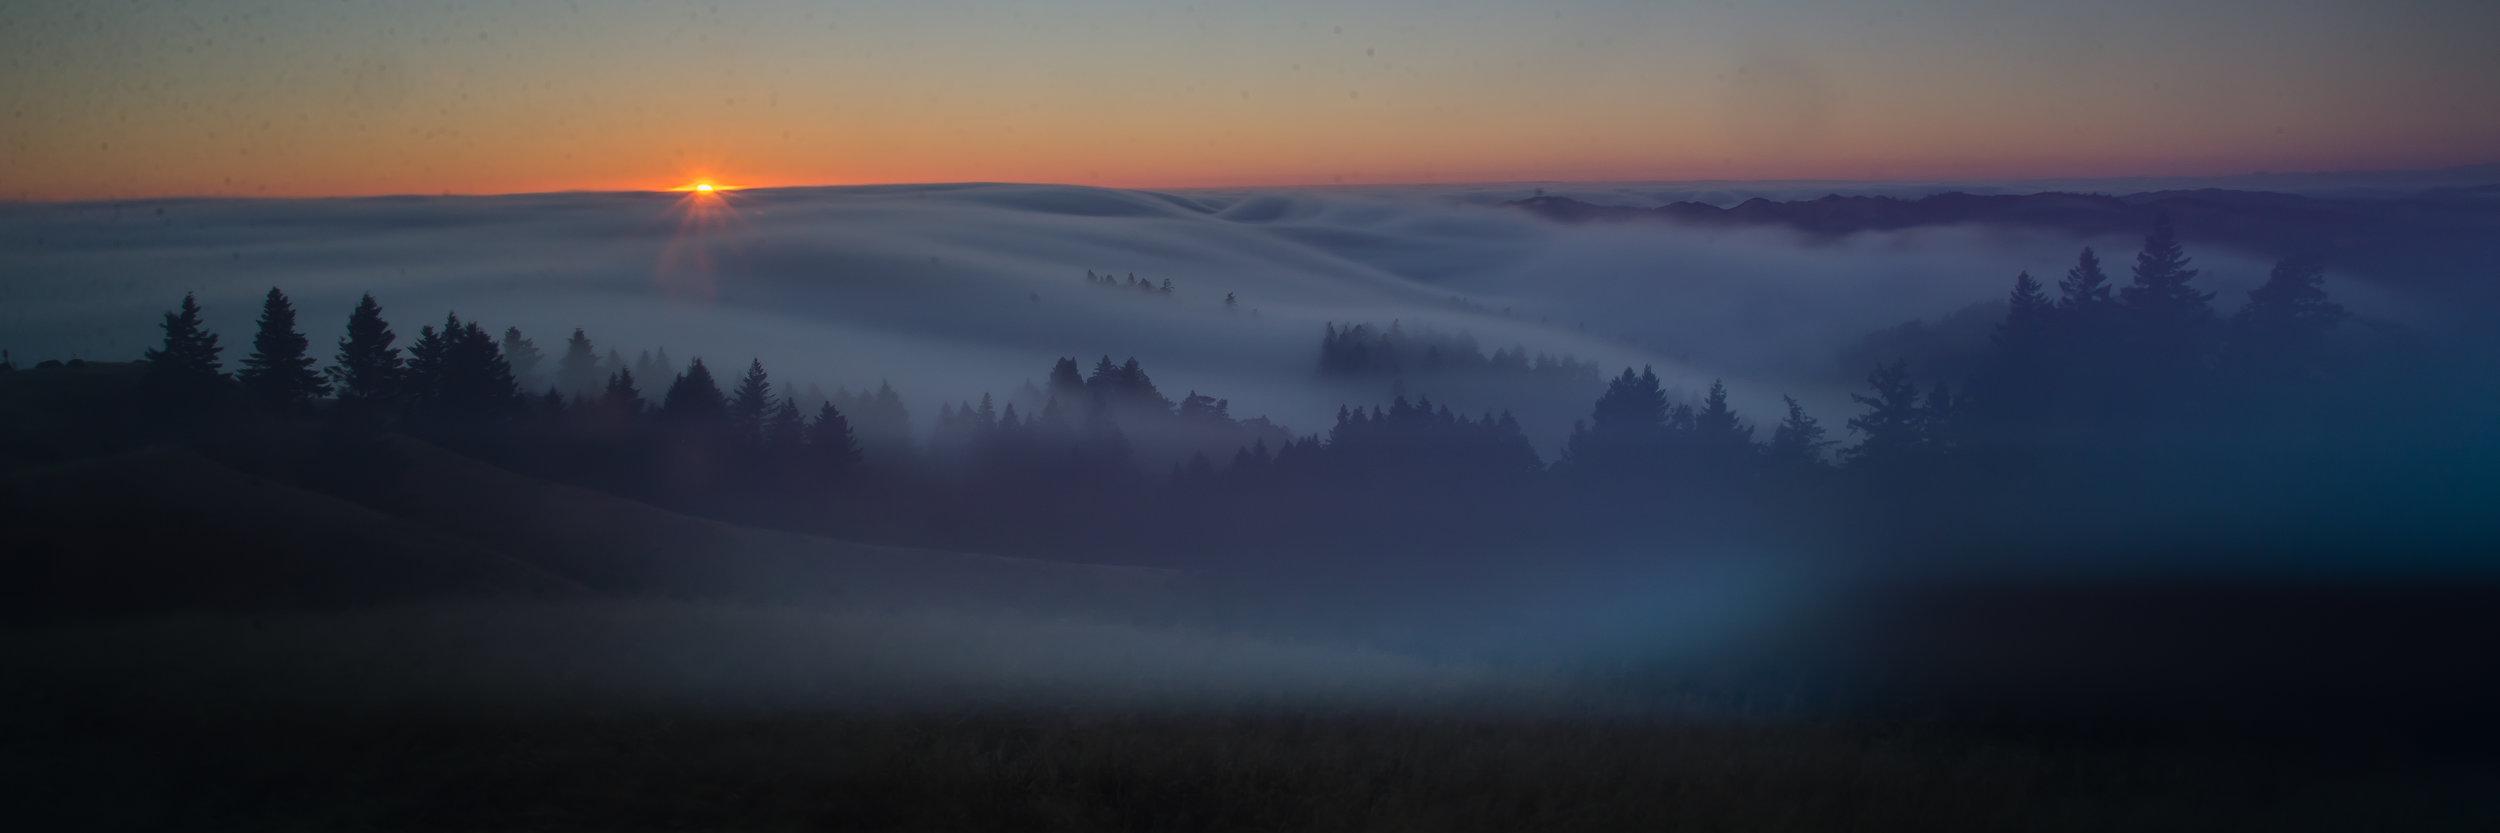 Ridgecrest-long-exposure-19d-0128.jpg